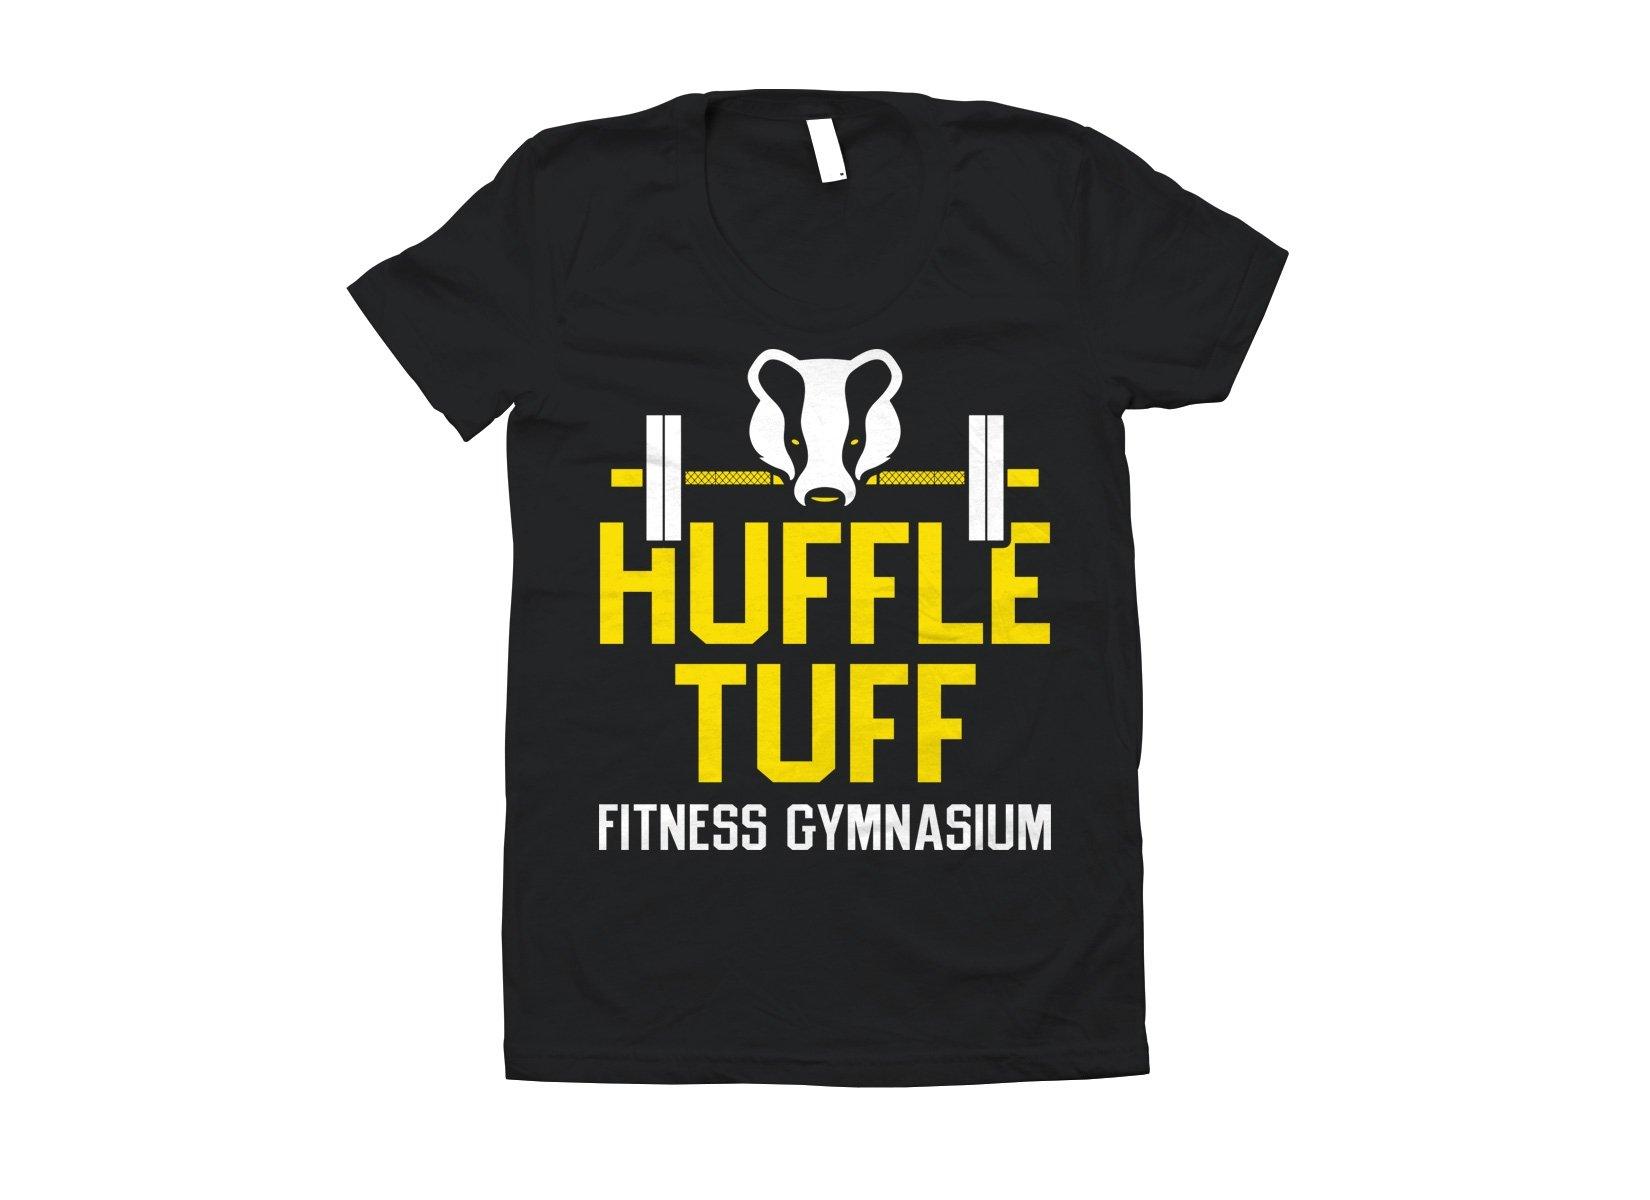 Huffle Tuff Gym on Juniors T-Shirt